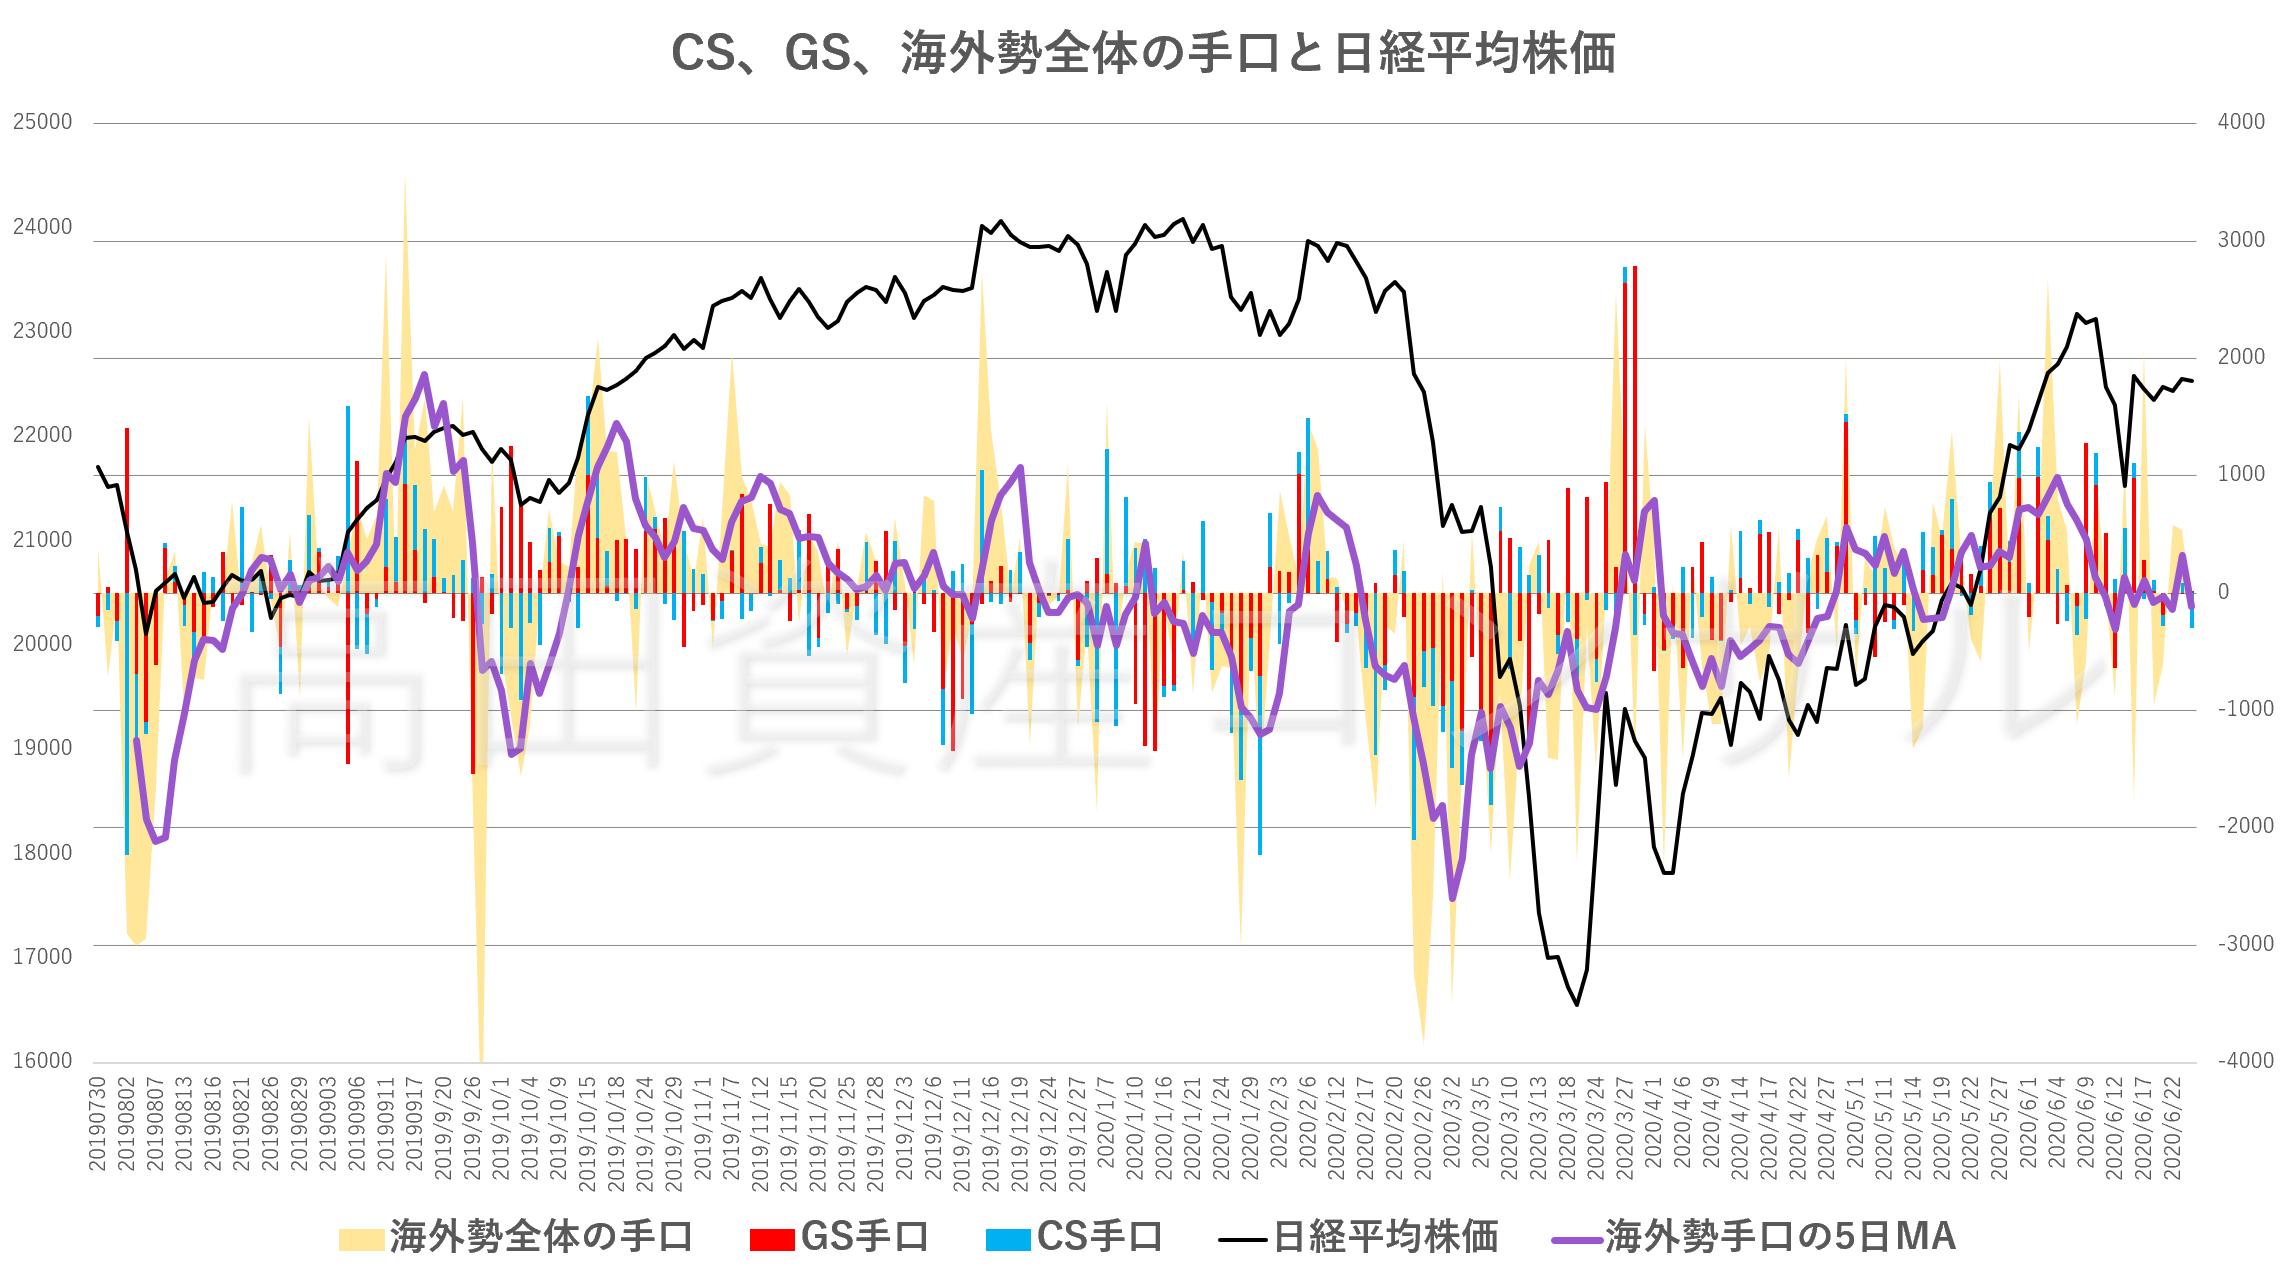 CS、GS、海外勢全体の手口と日経平均株価20200624